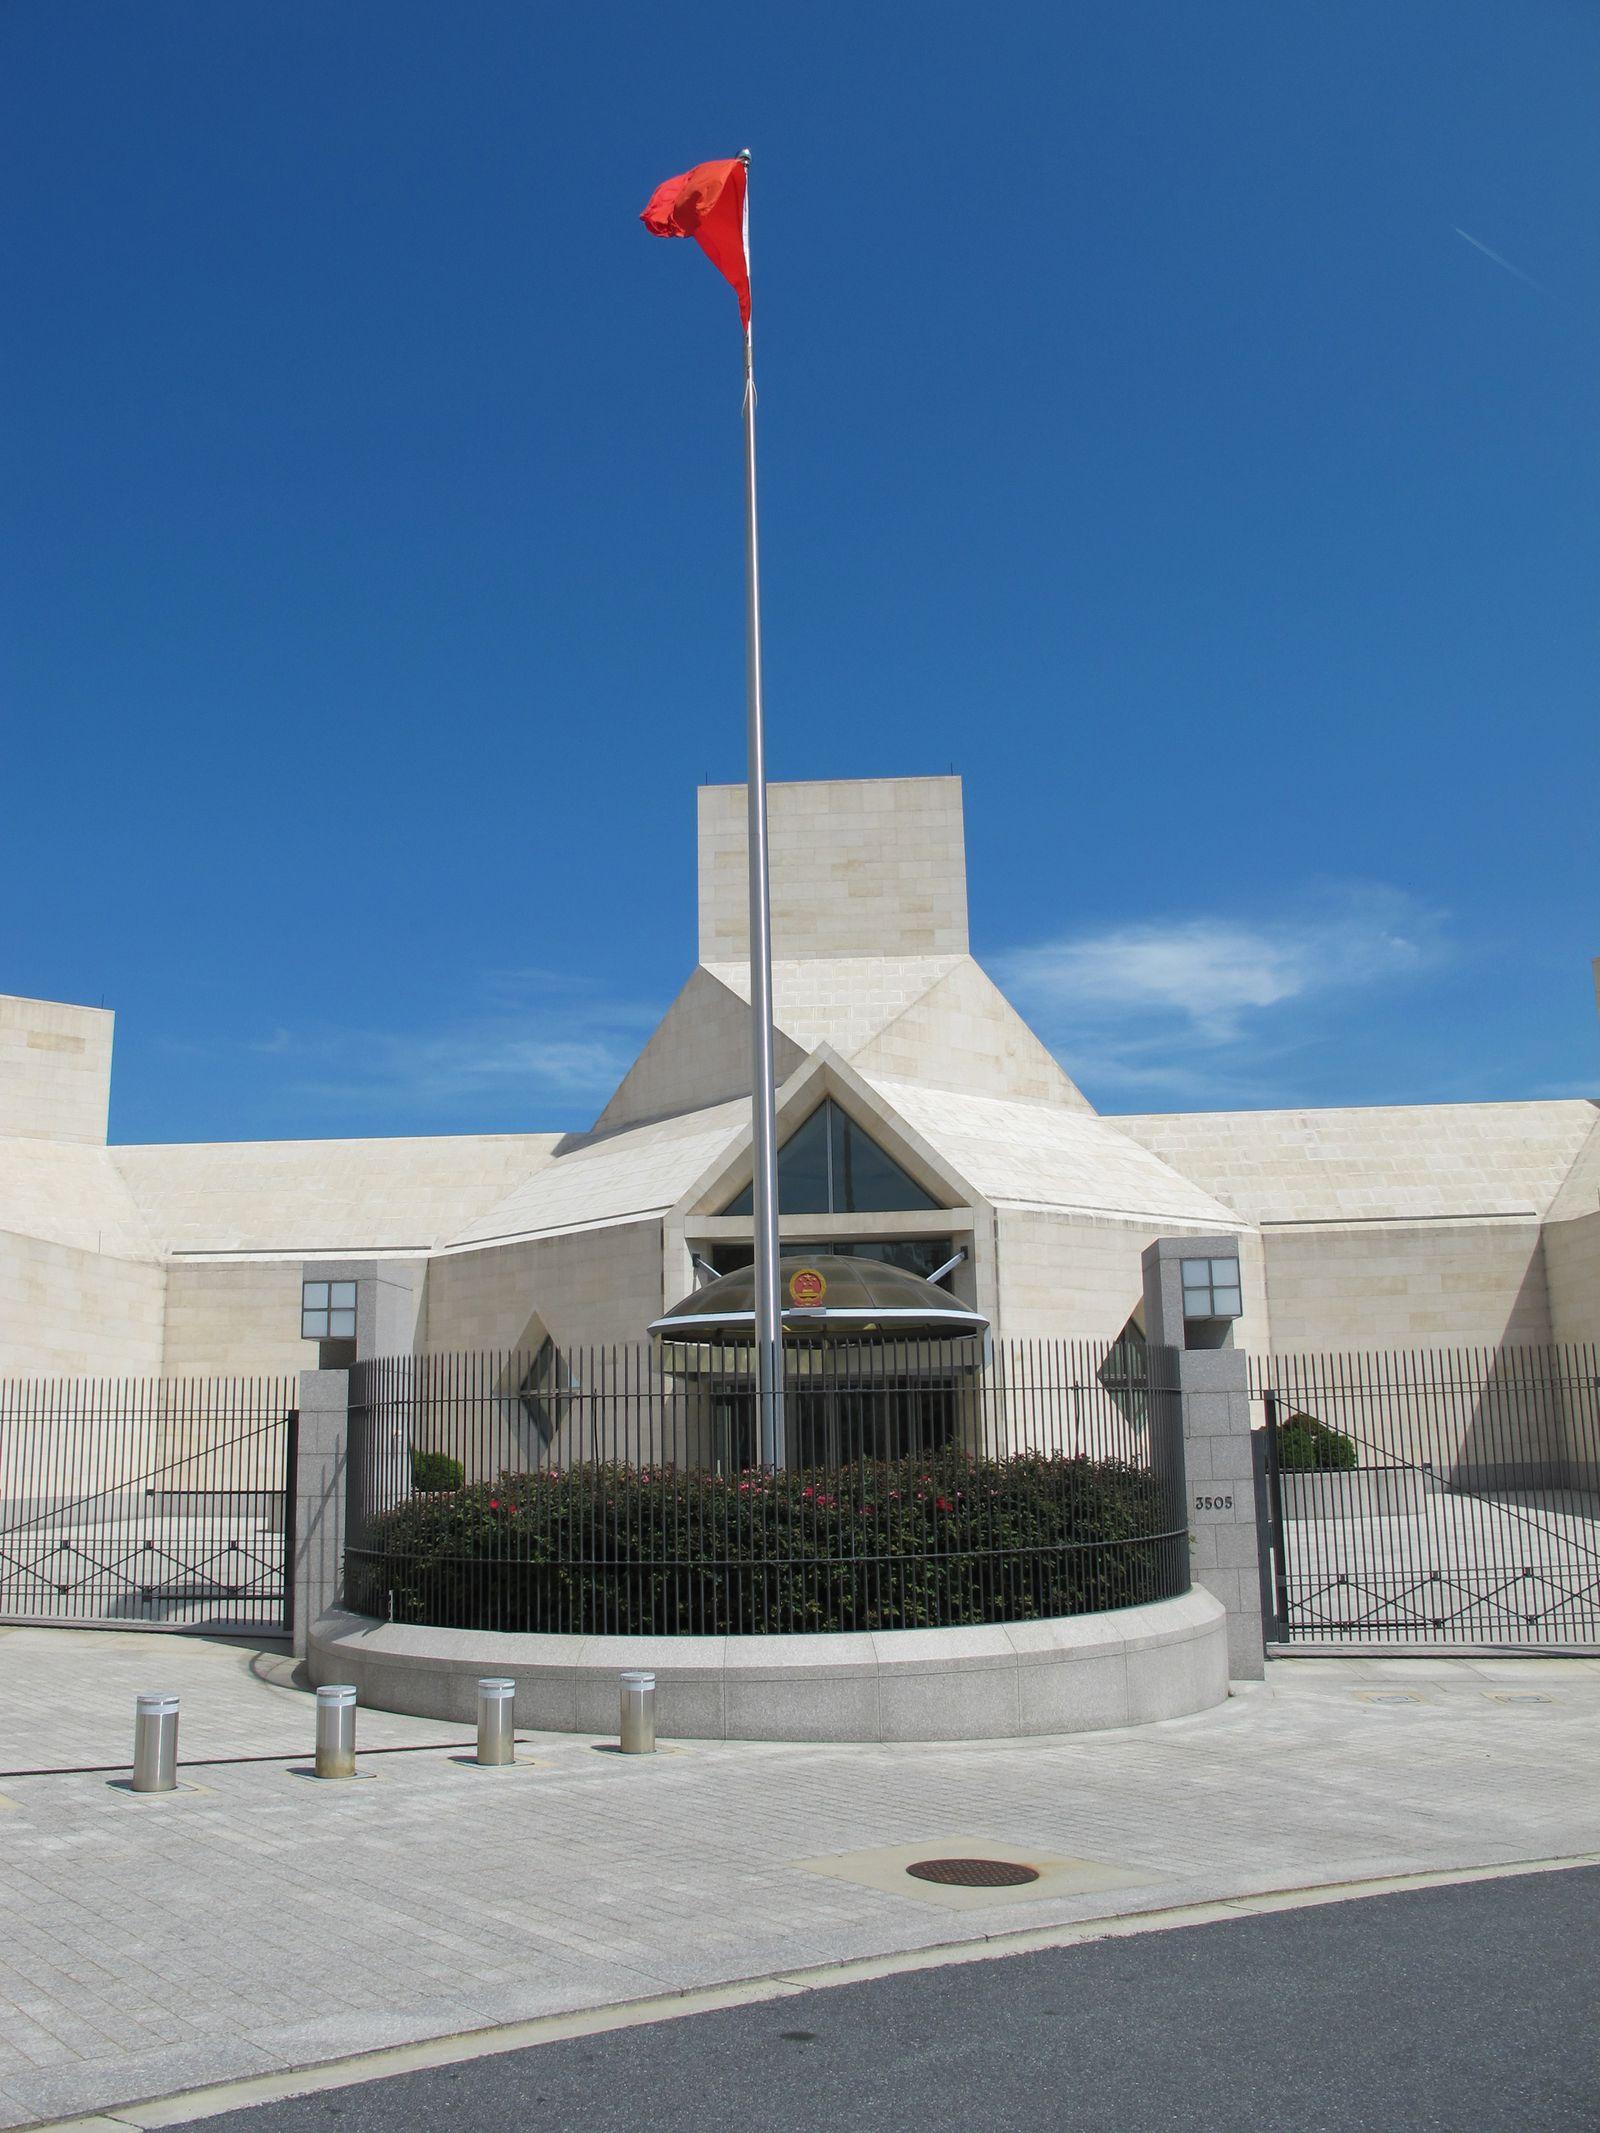 Chinesische Botschaft/ Washington